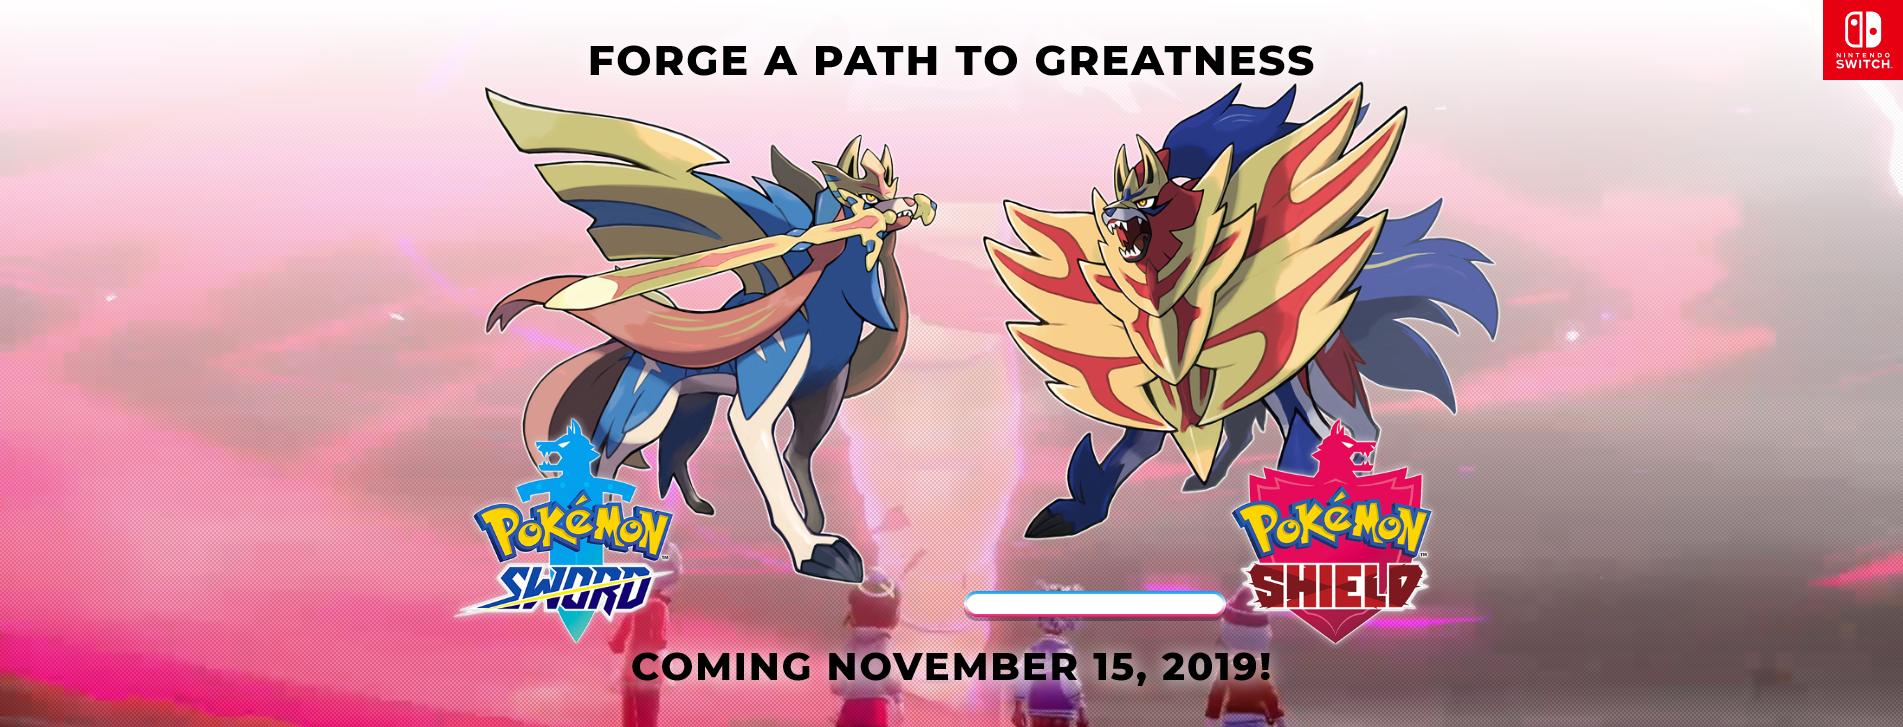 Pokemon Sword Shield New Abilities Hidden Abilities